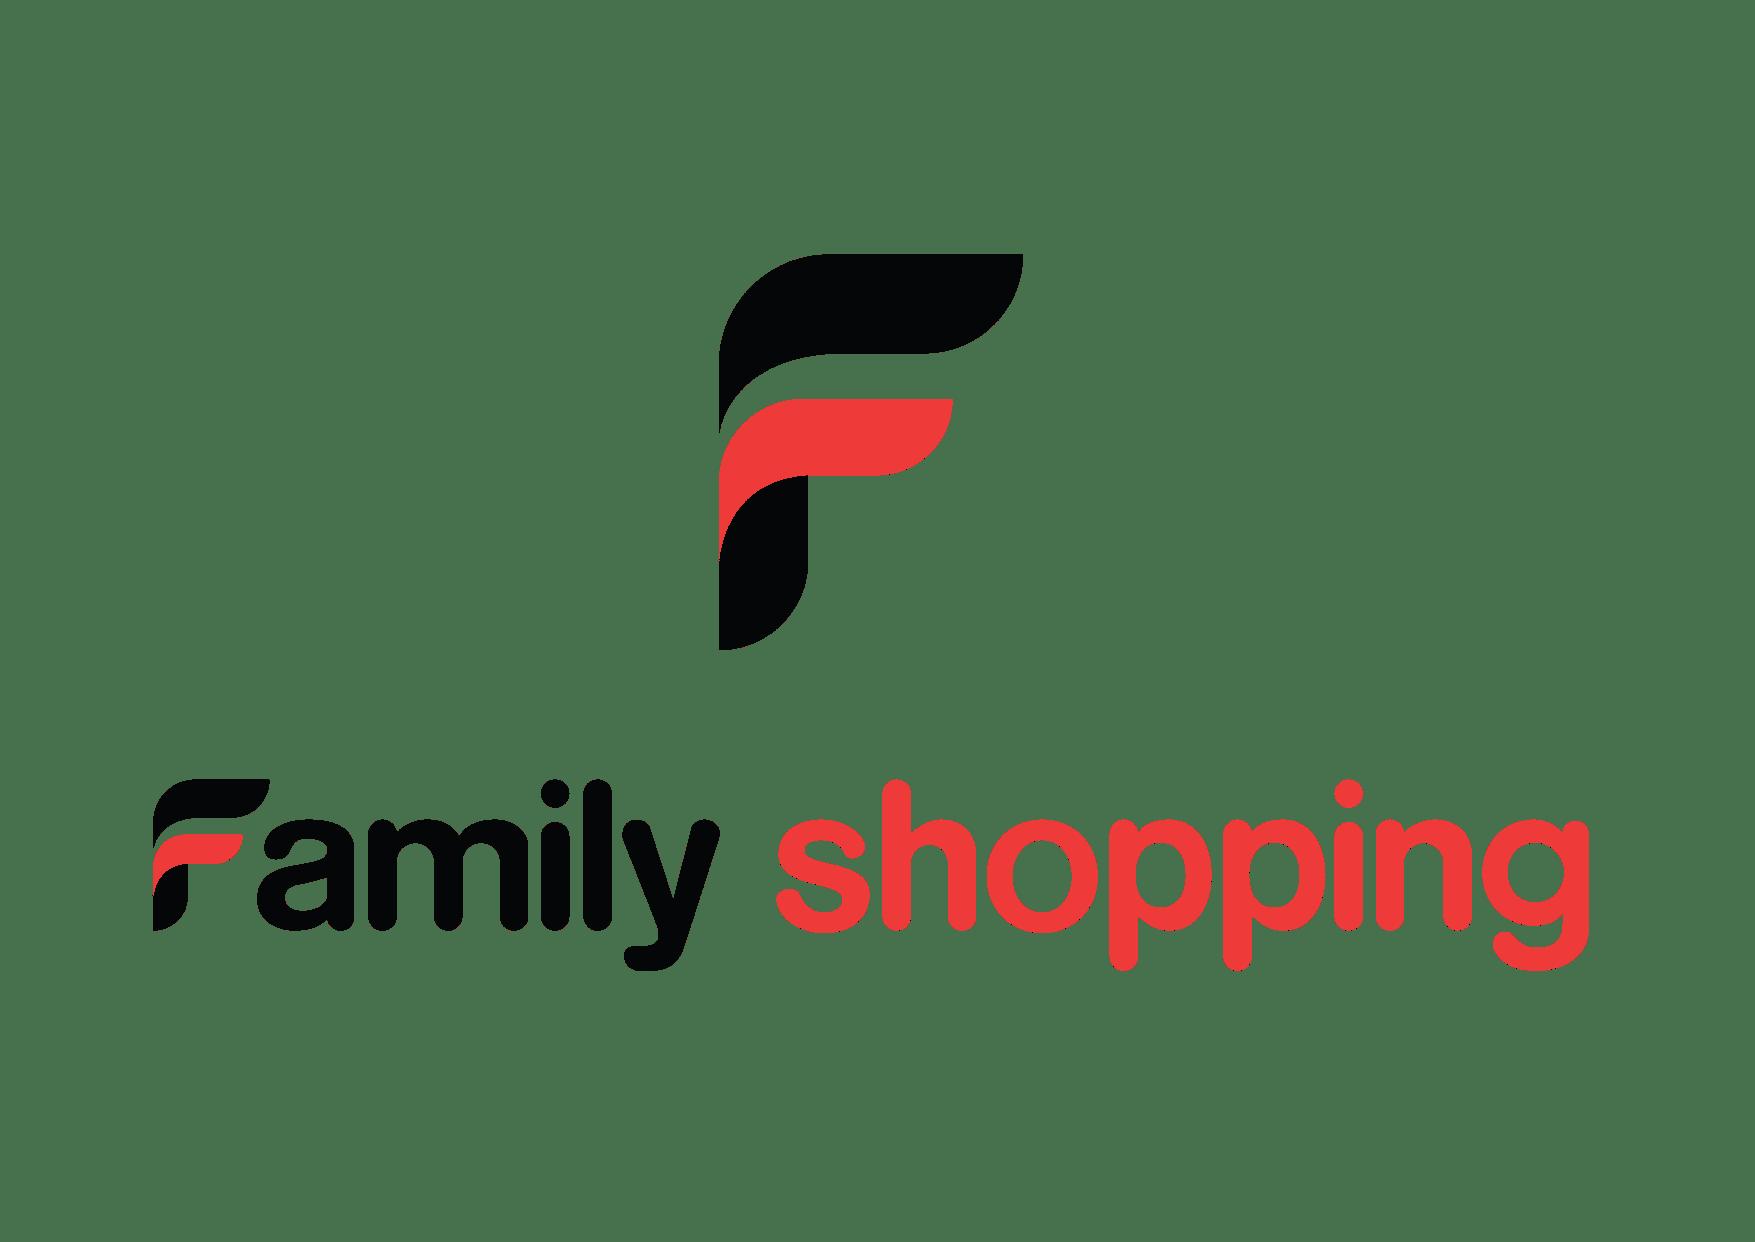 FAMILY SHOPPING 01